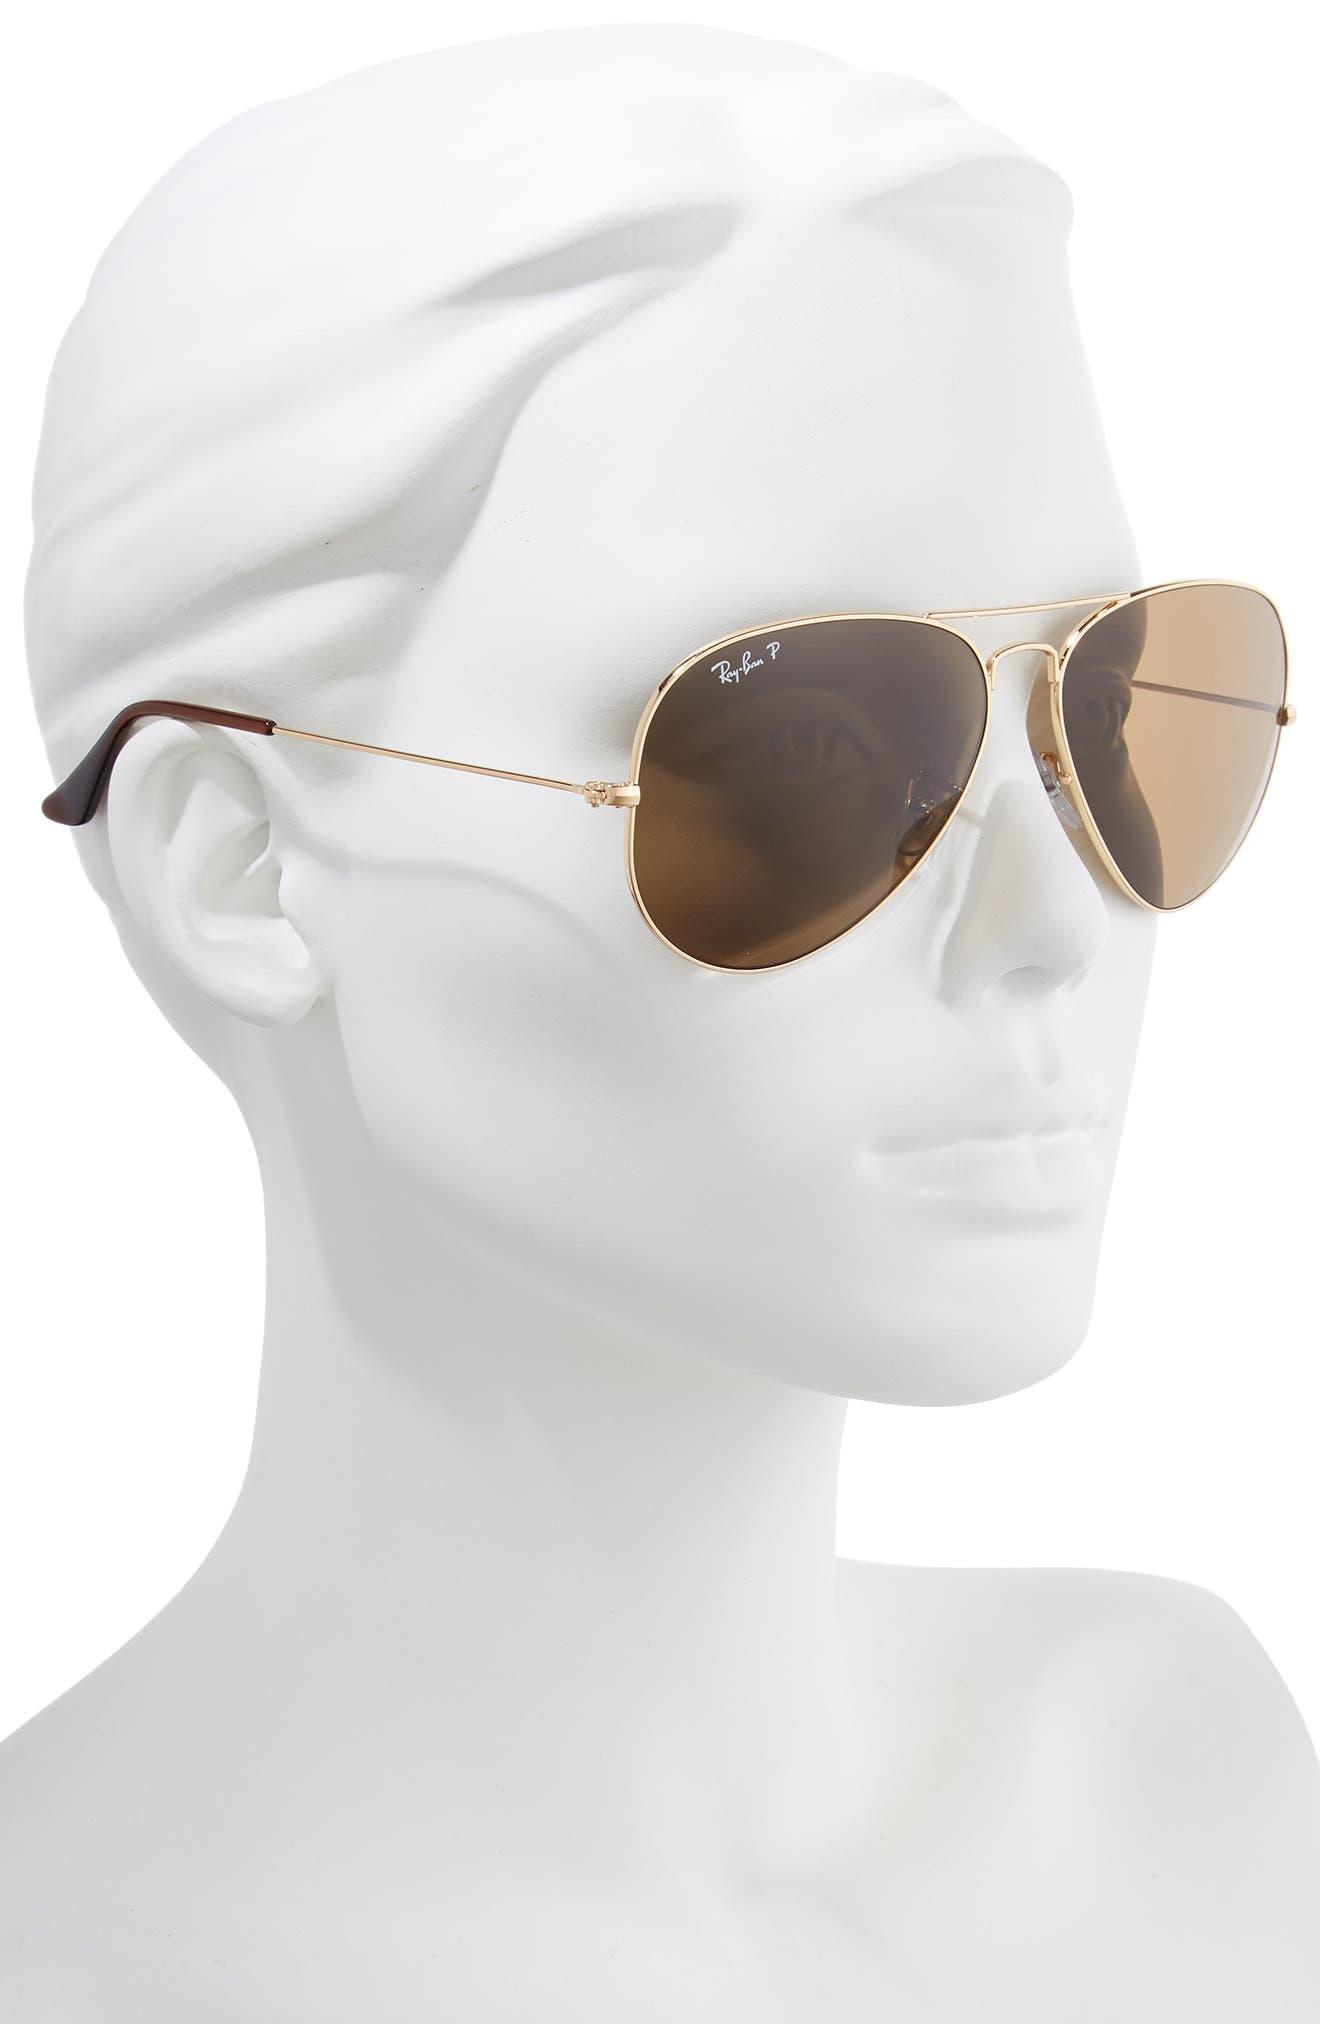 Original 62mm Oversize Polarized Aviator Sunglasses,                             Alternate thumbnail 2, color,                             710